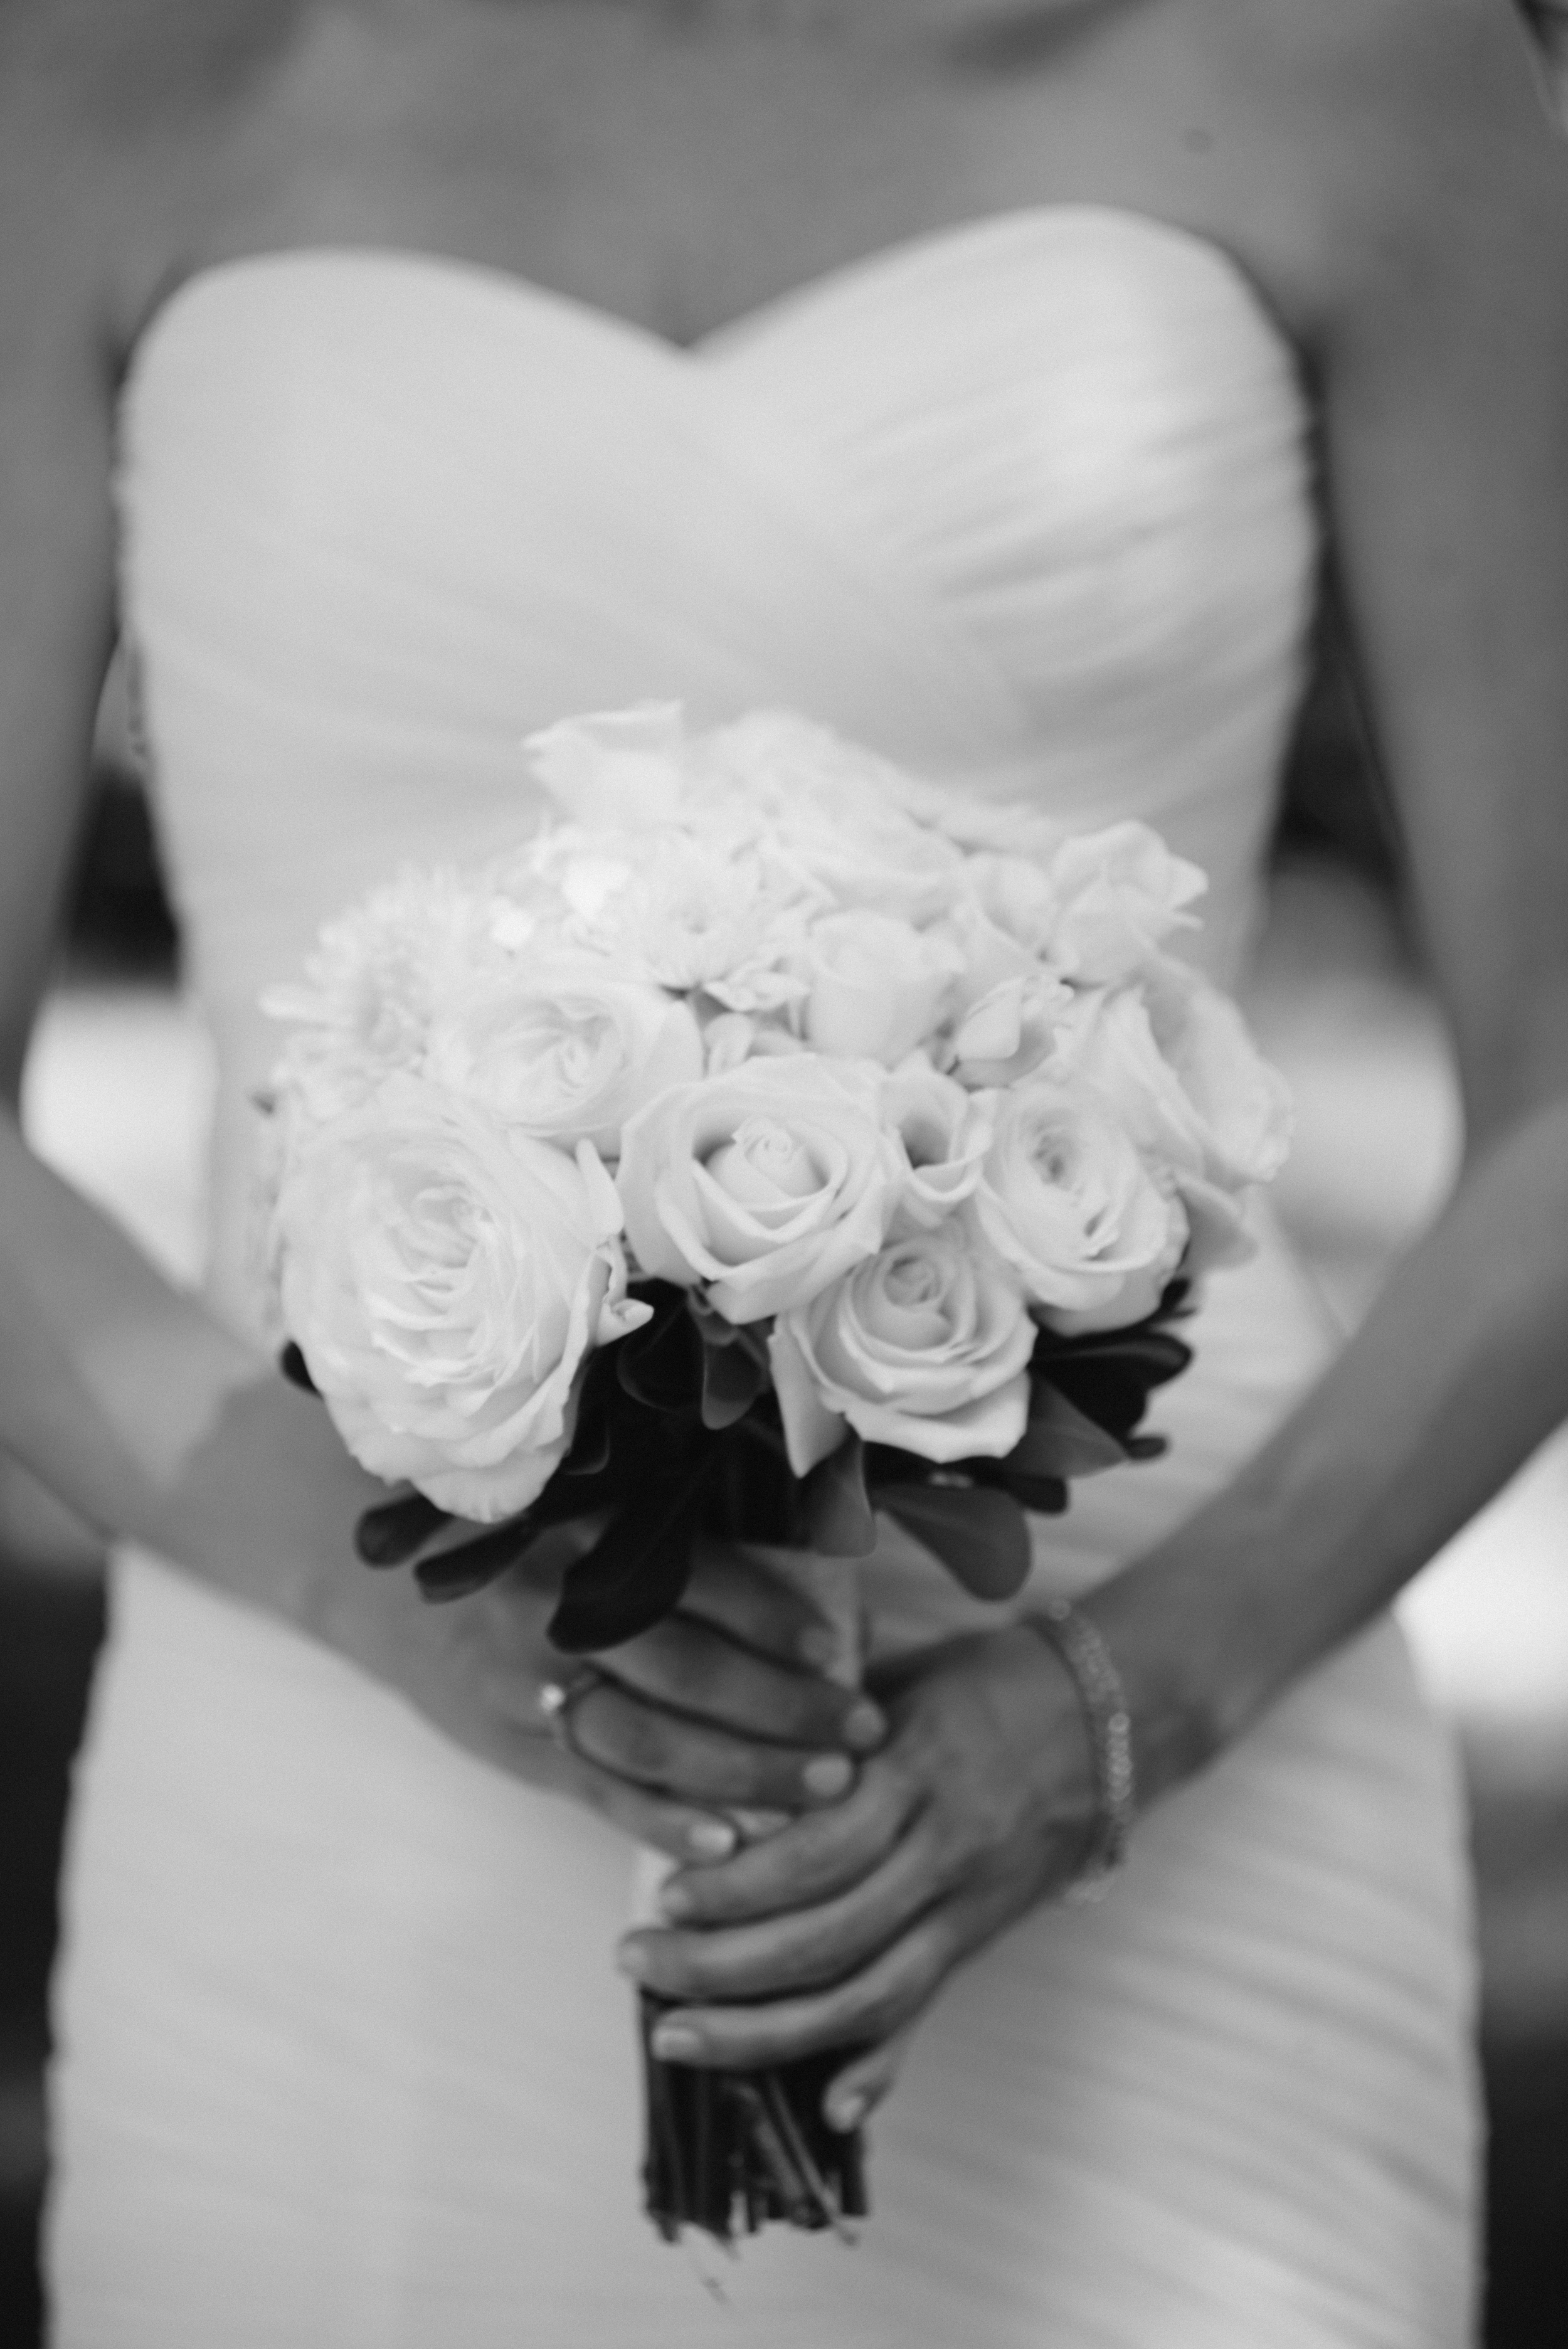 Matt_Swetel_Photography_Erin_and_Jeff_married022.jpg